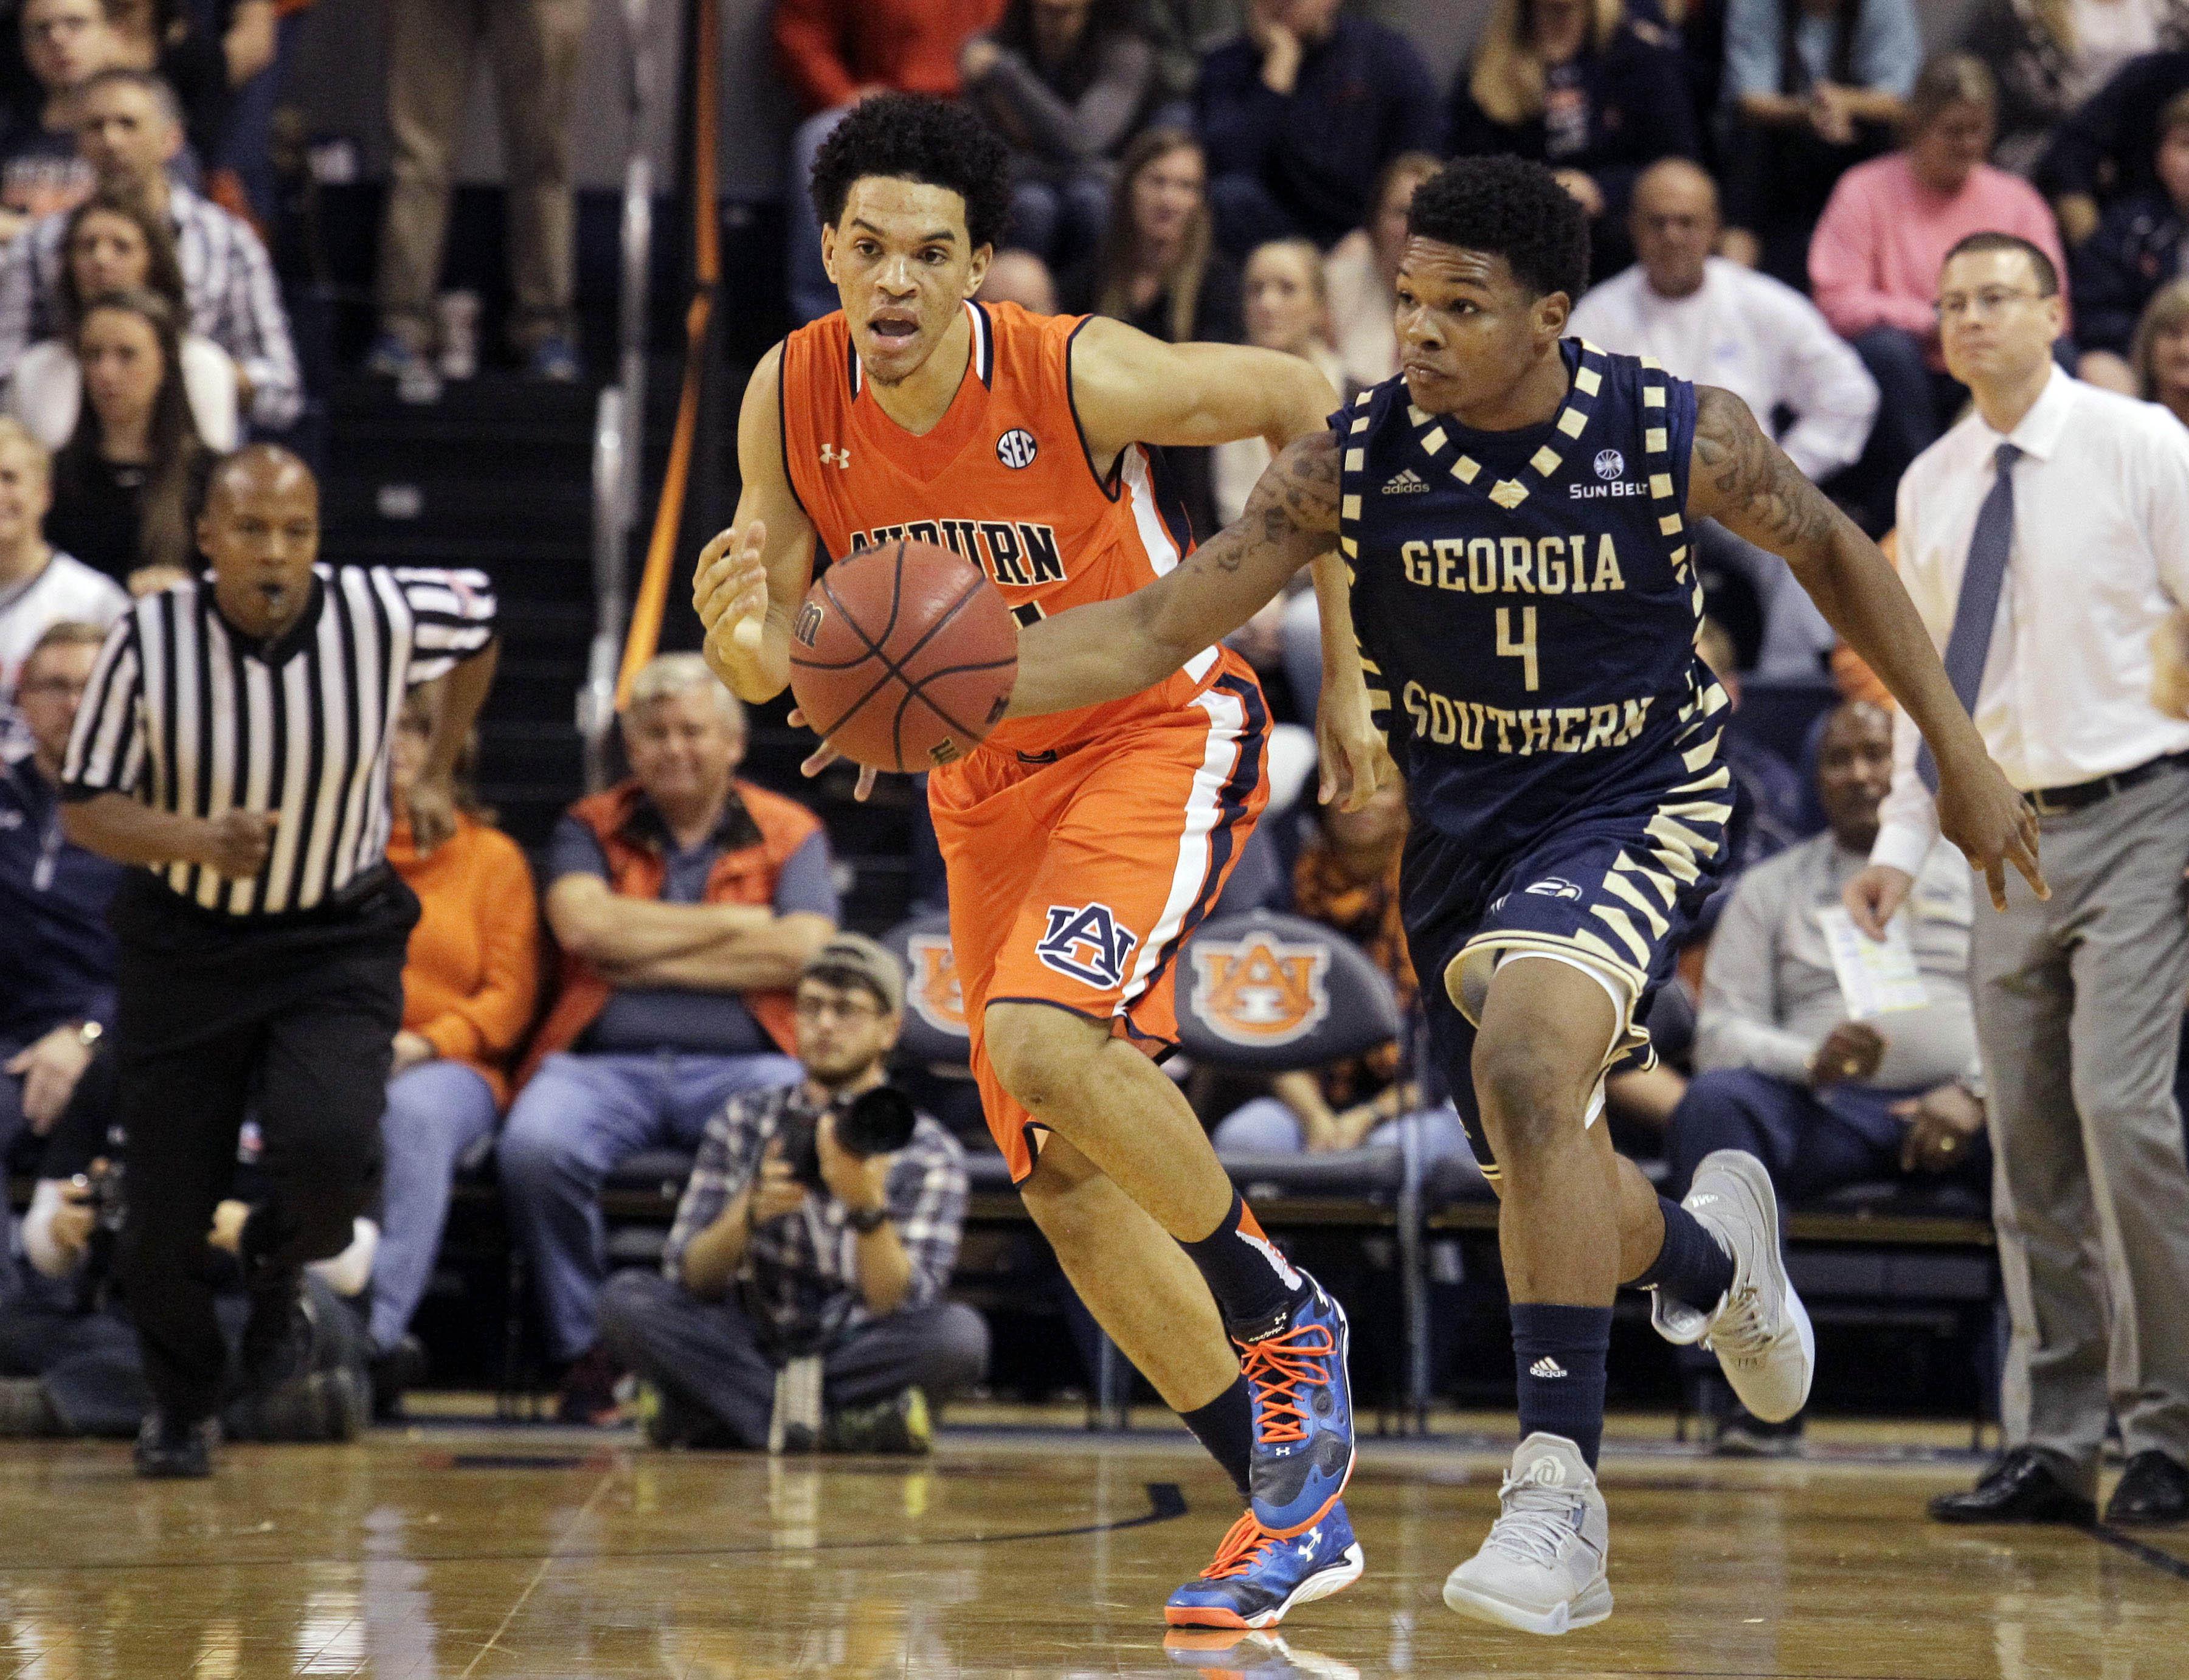 NCAA Basketball: Georgia Southern at Auburn